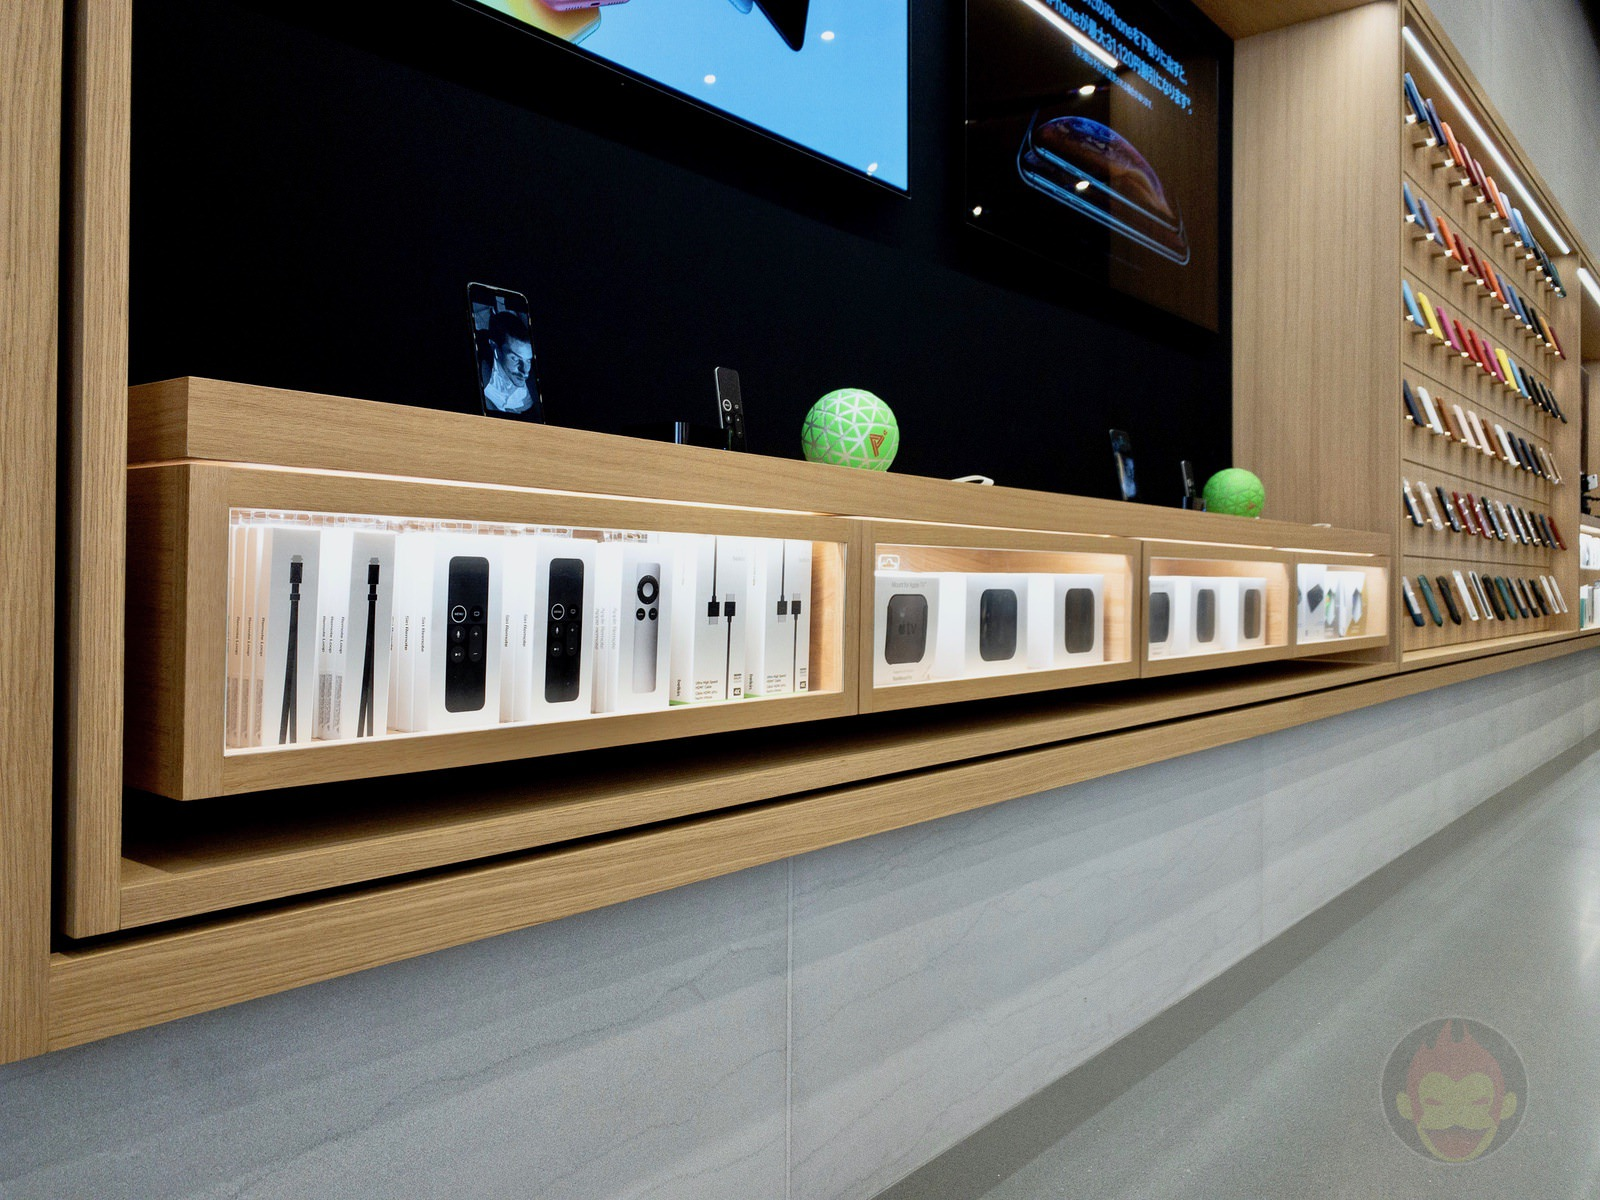 Apple Store Omotesando Basement floor renewal 12